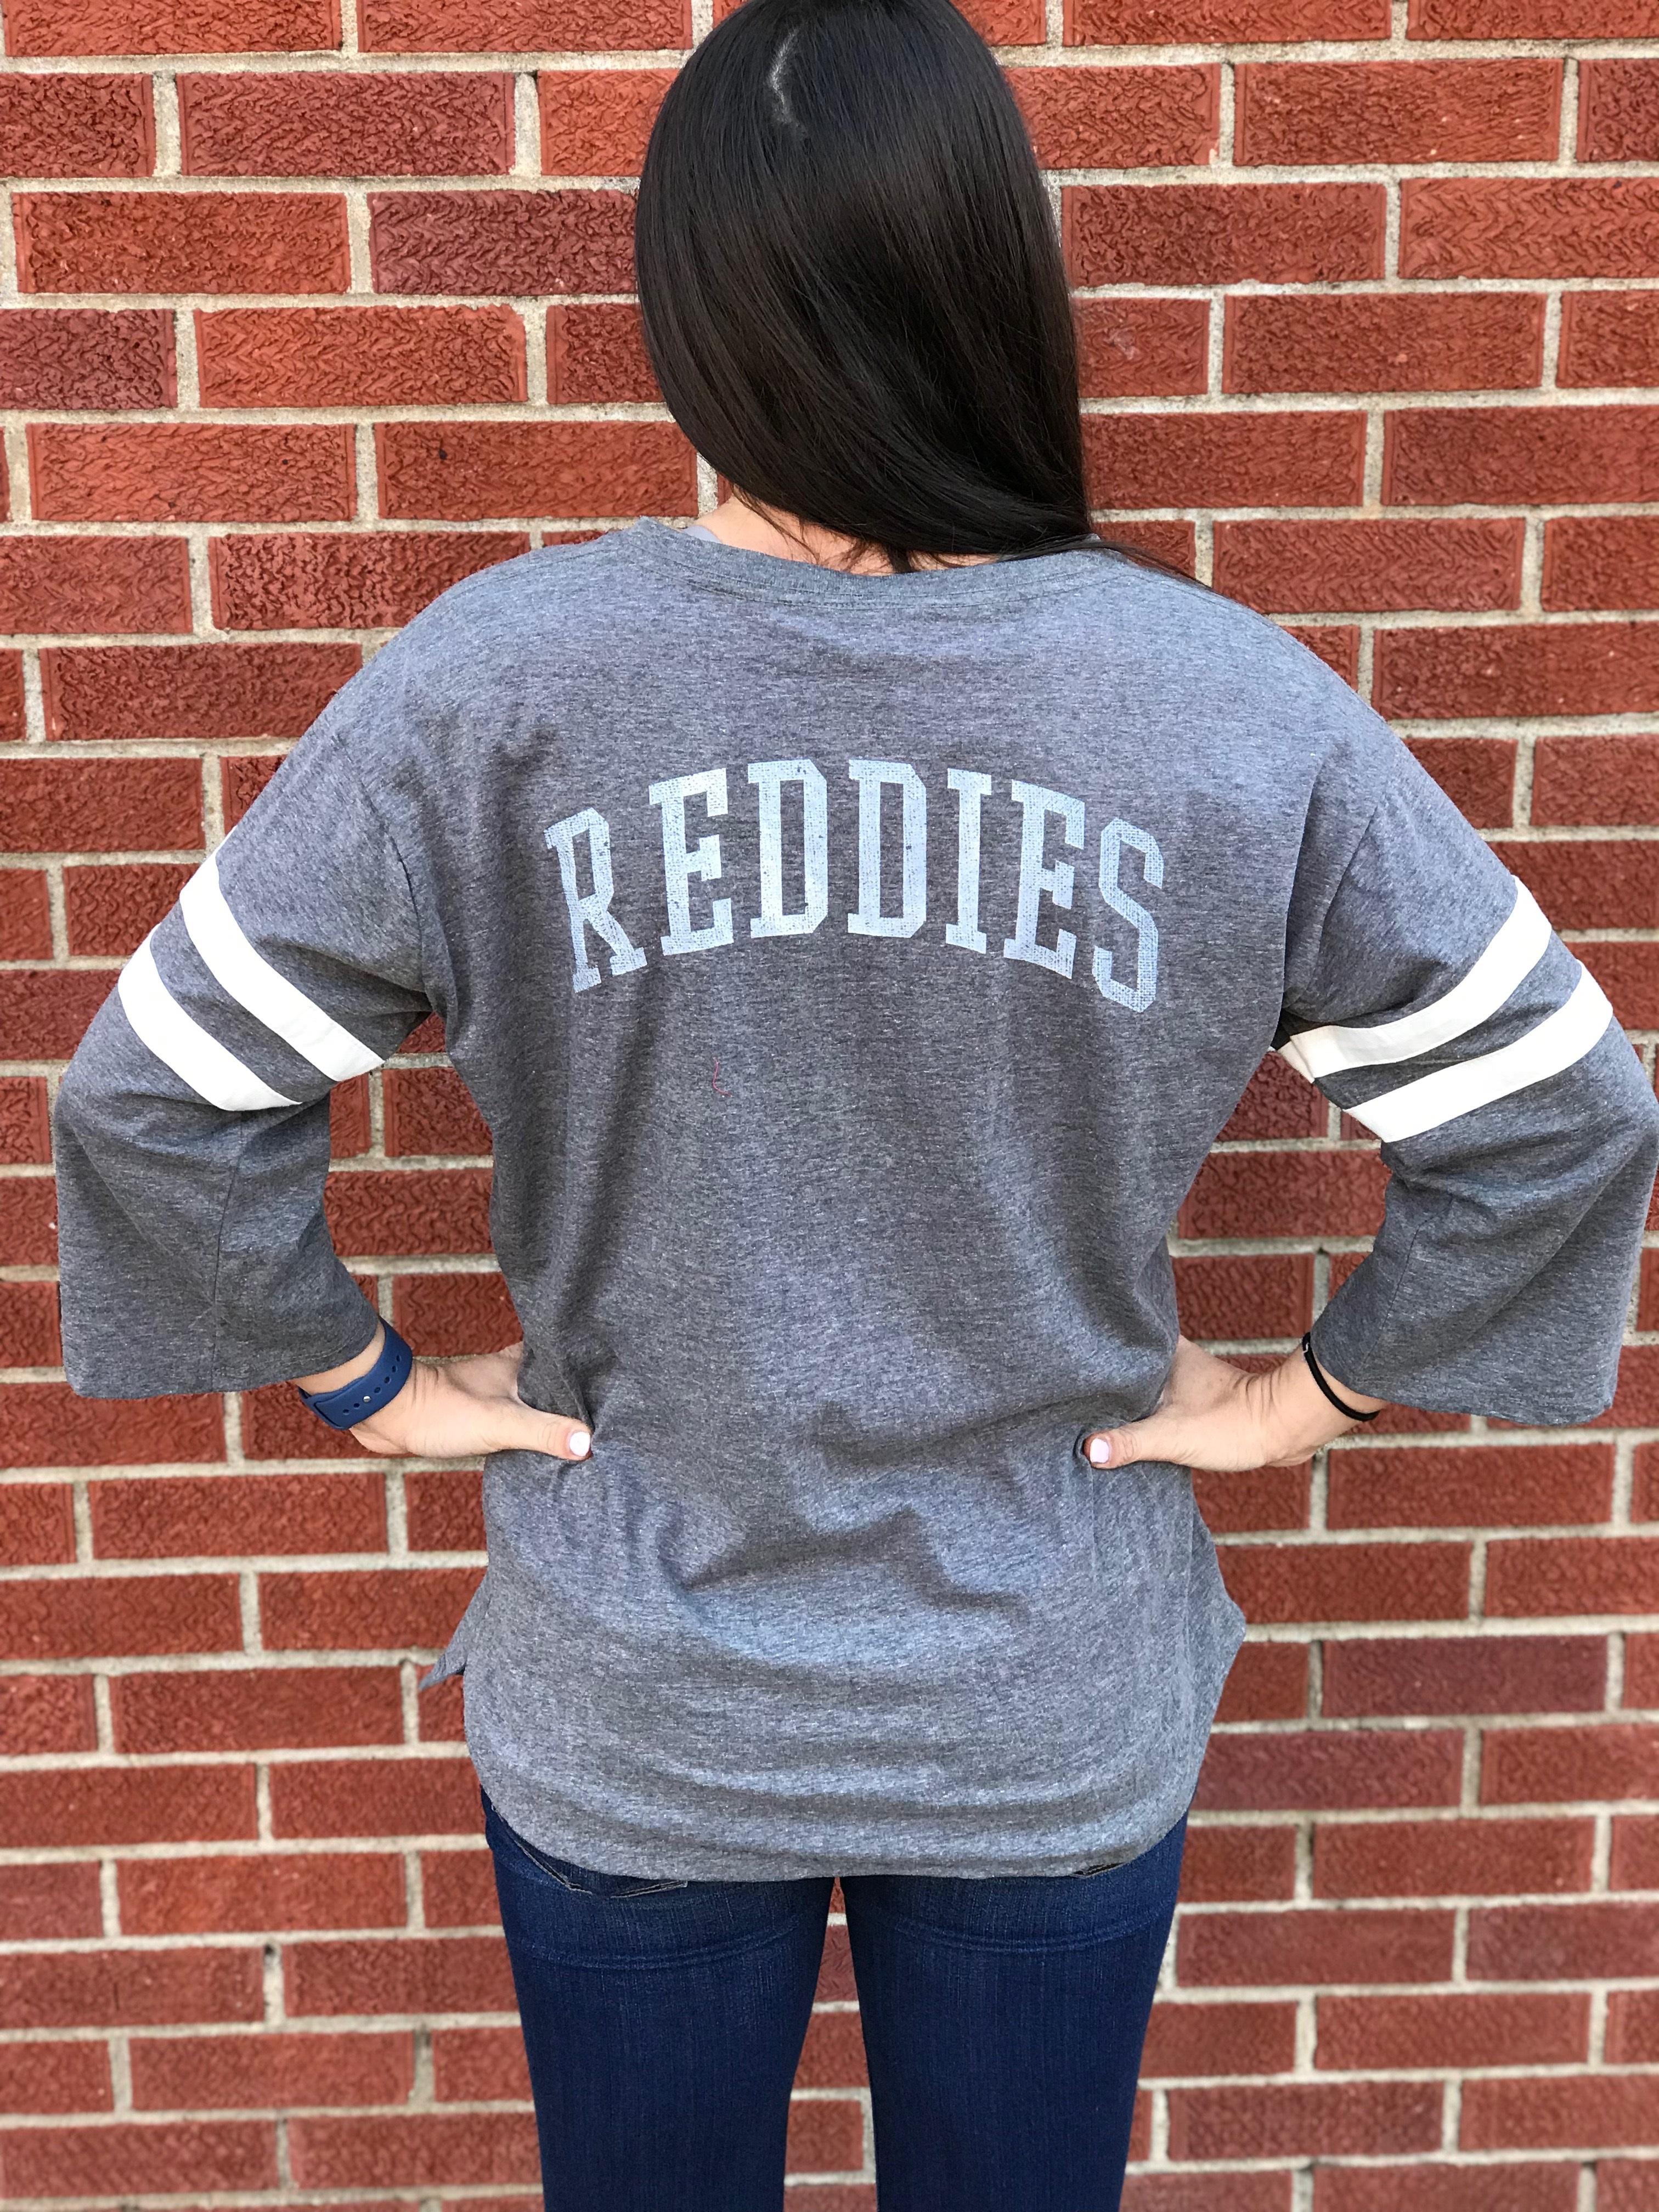 REDDIES OVERSIZED 3/4 SLEEVE